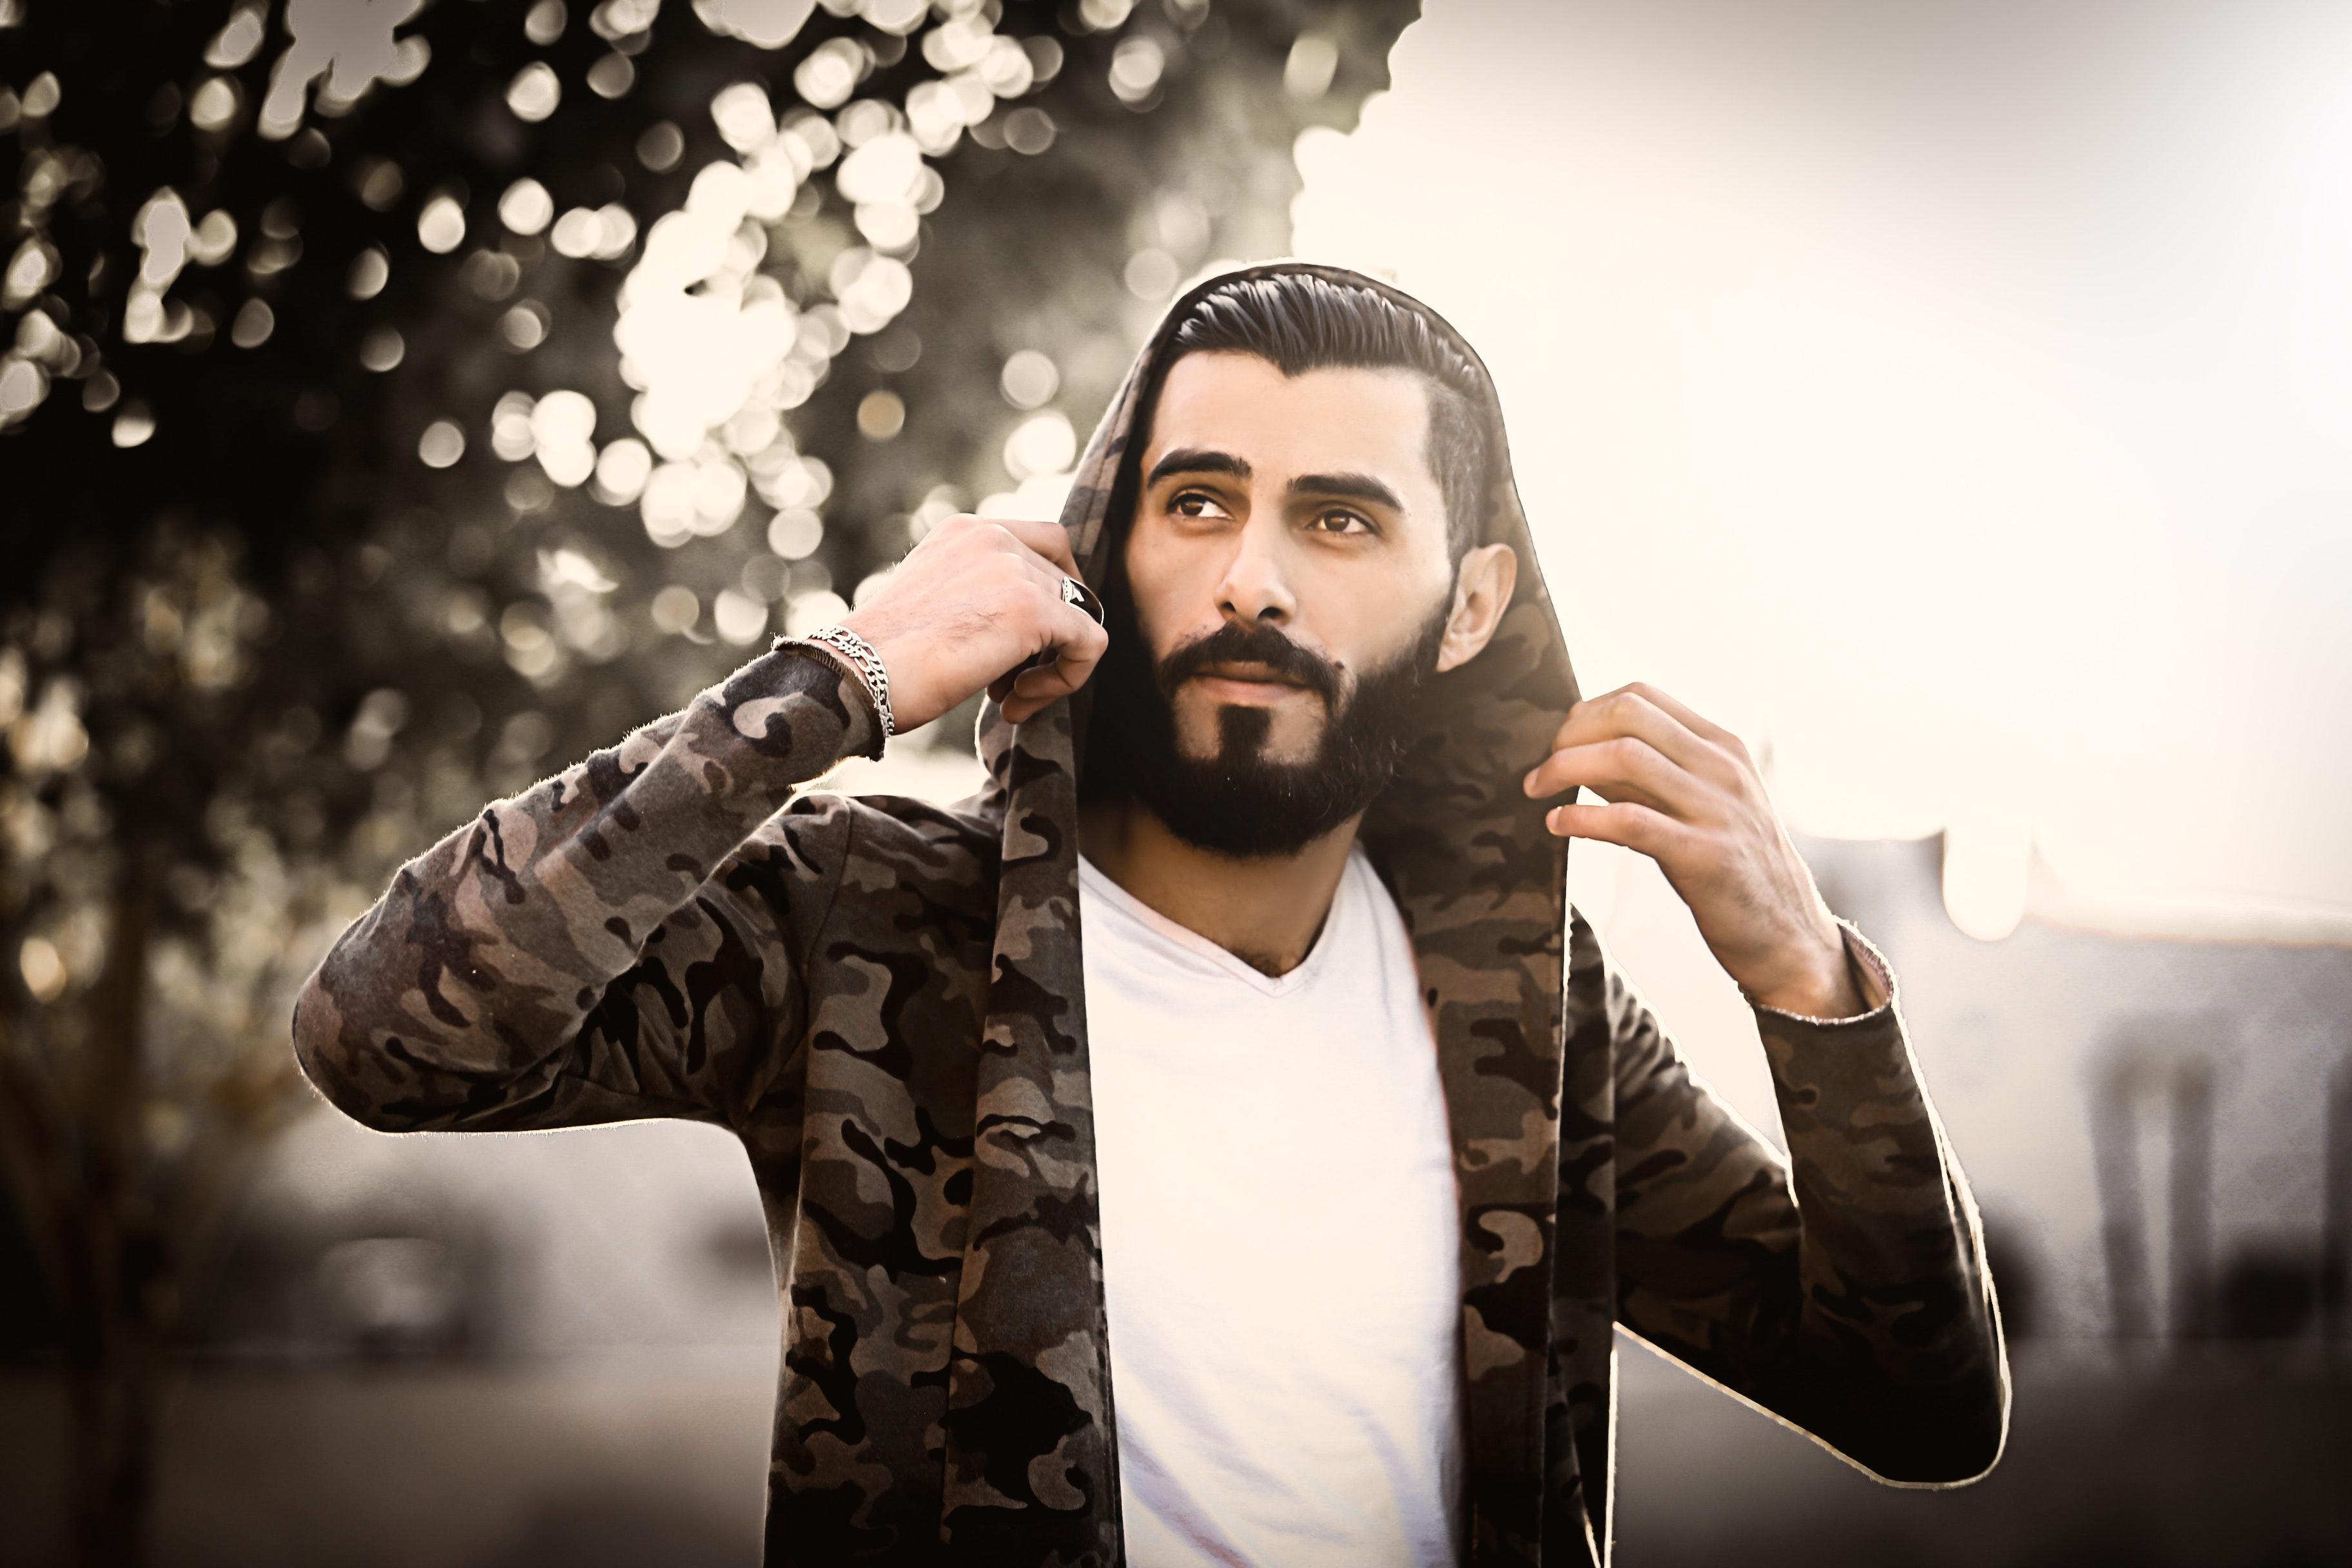 Man wearing camouflage hoodie and white shirt photo